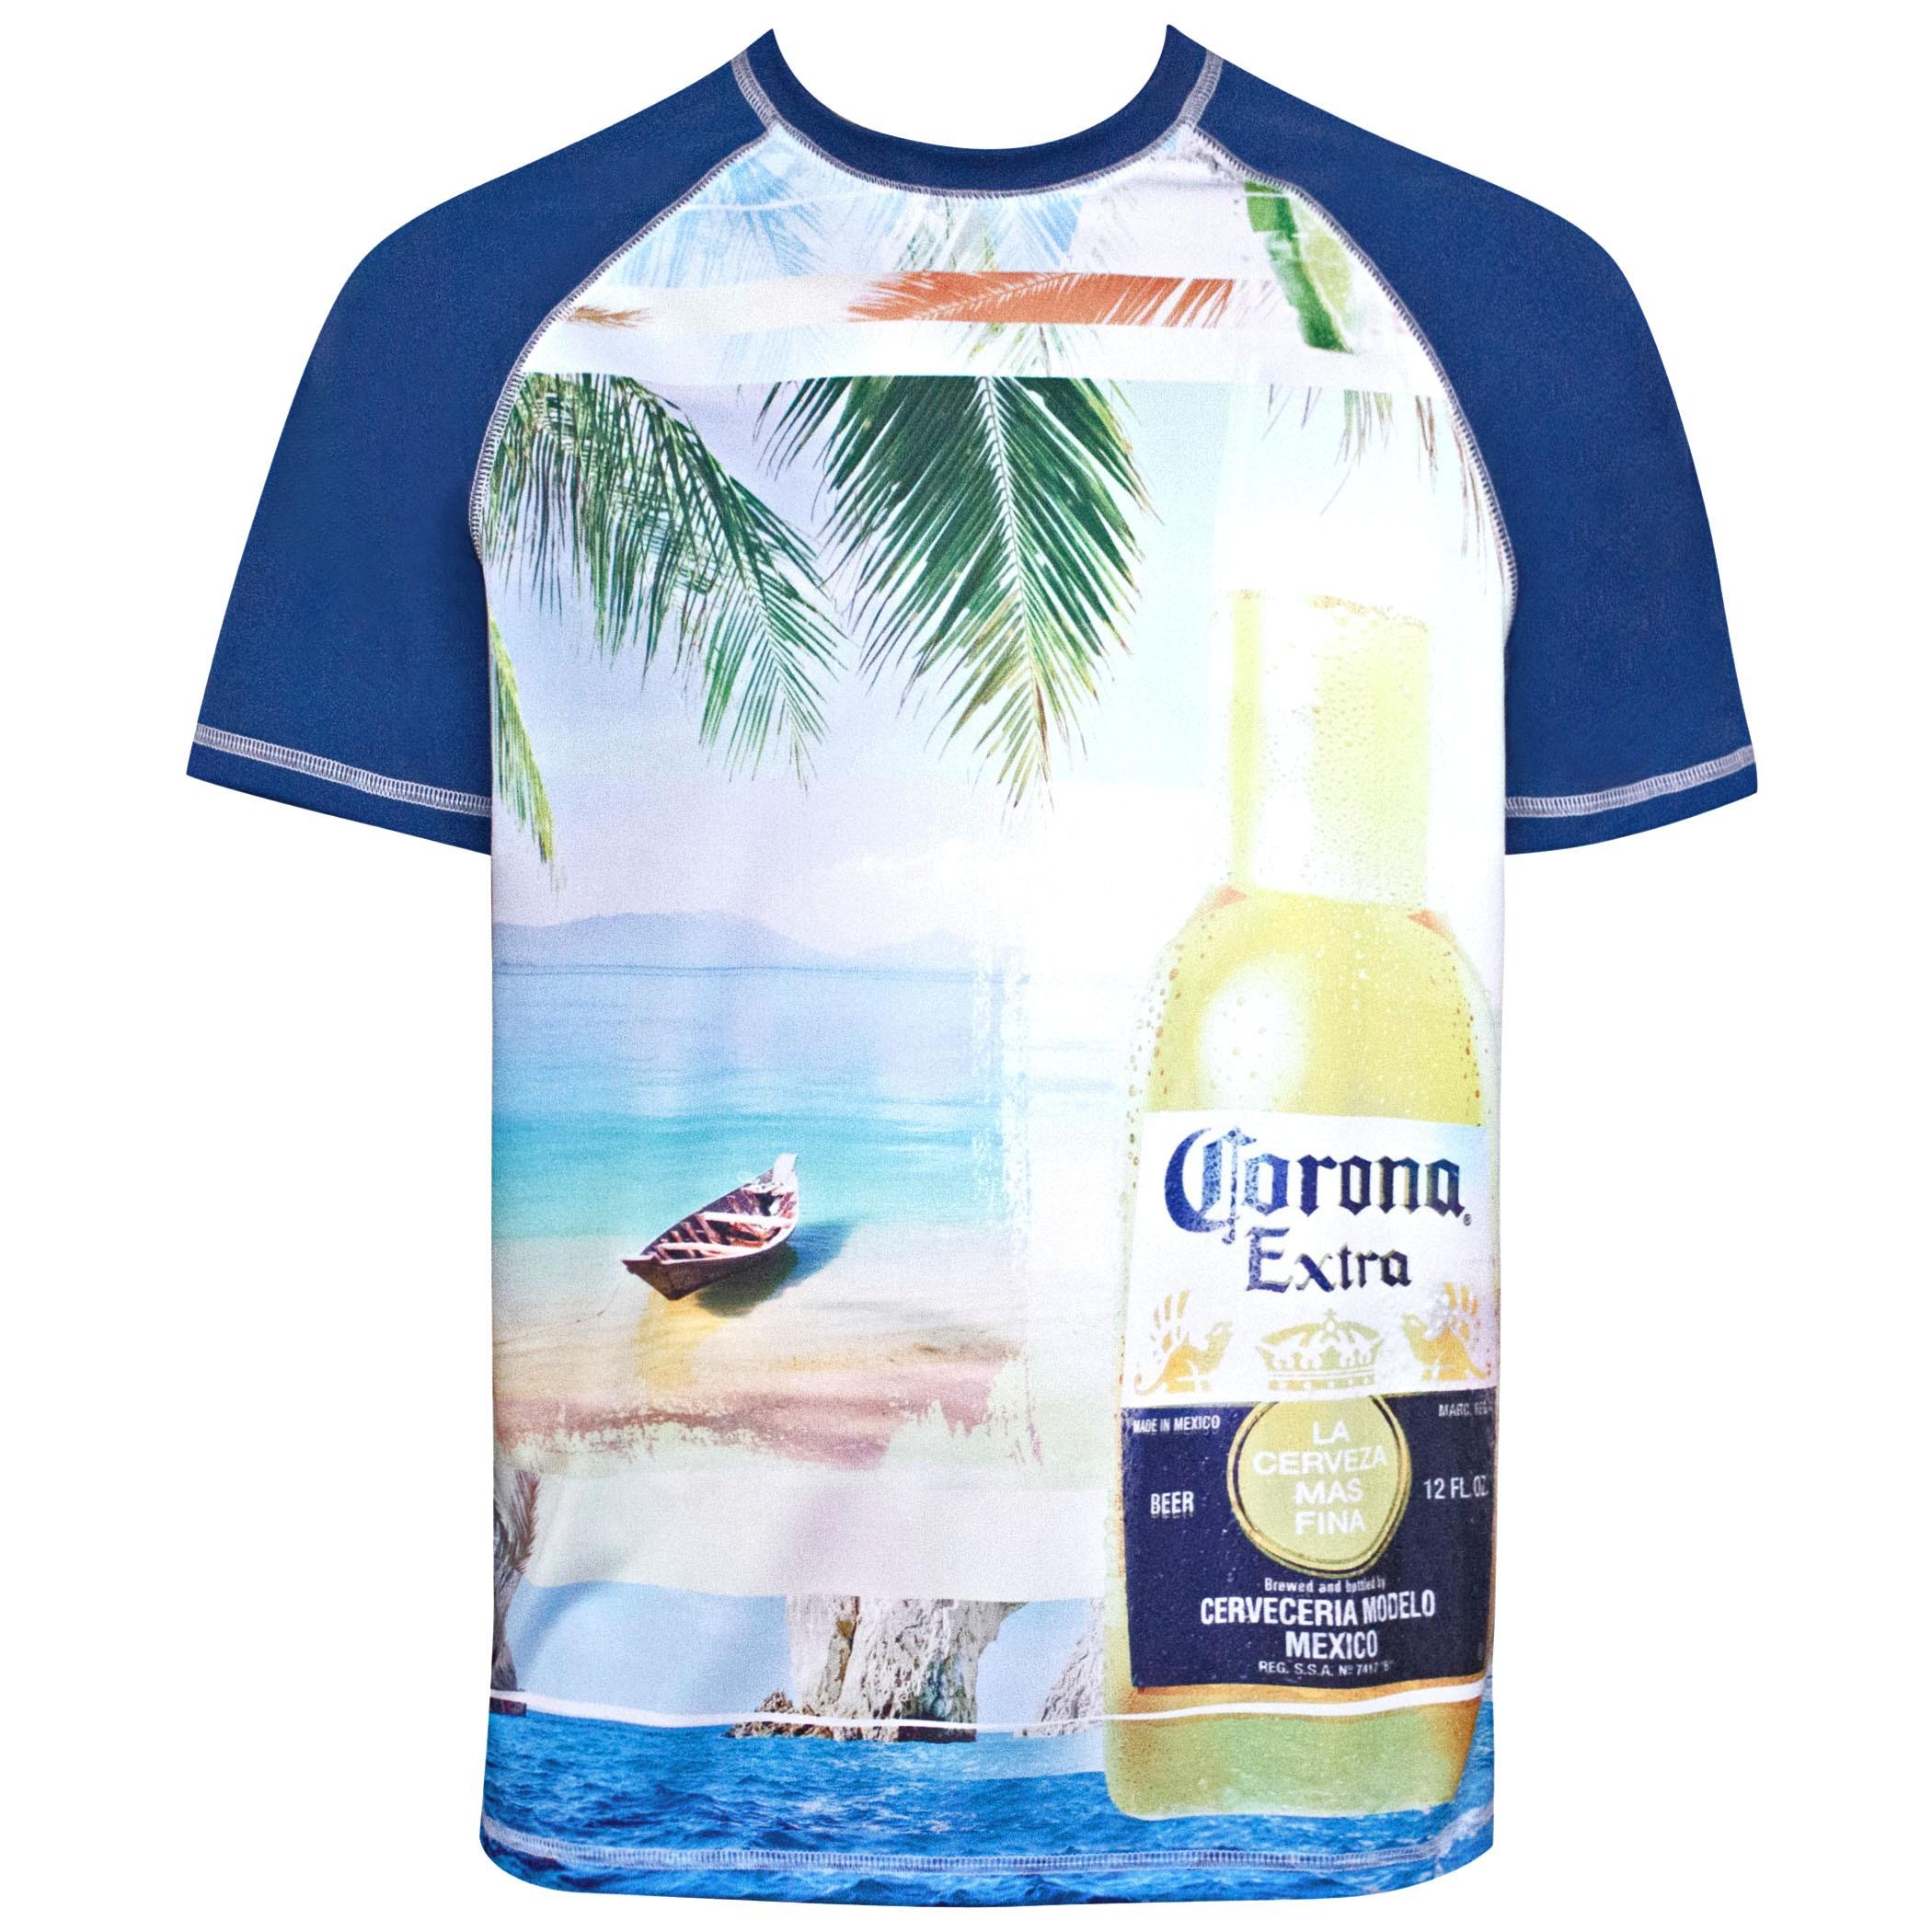 Corona Beach Scene Tee Shirt